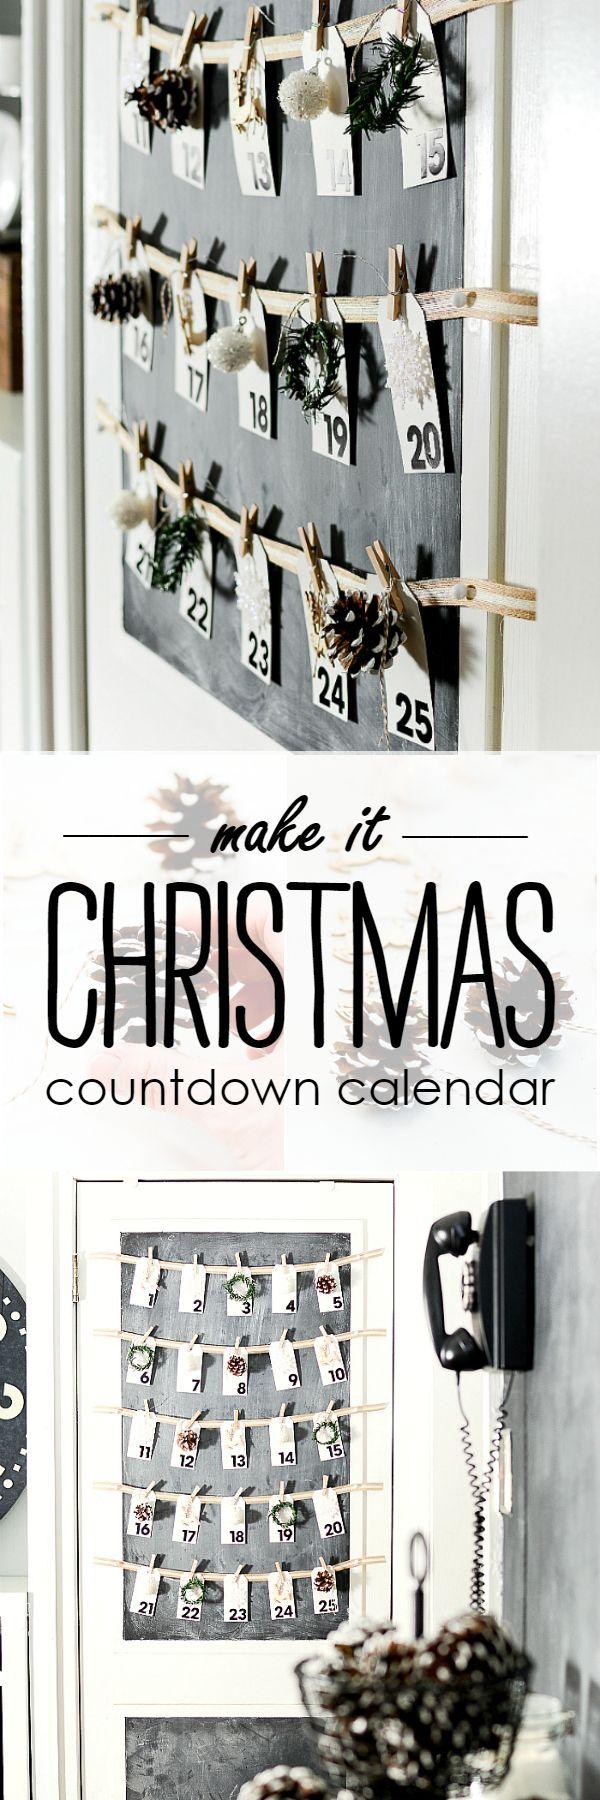 Merry Christmas Countdown Calendar - Advent Calendar DIY @It All Started With Paint www.itallstartedwithpaint.com